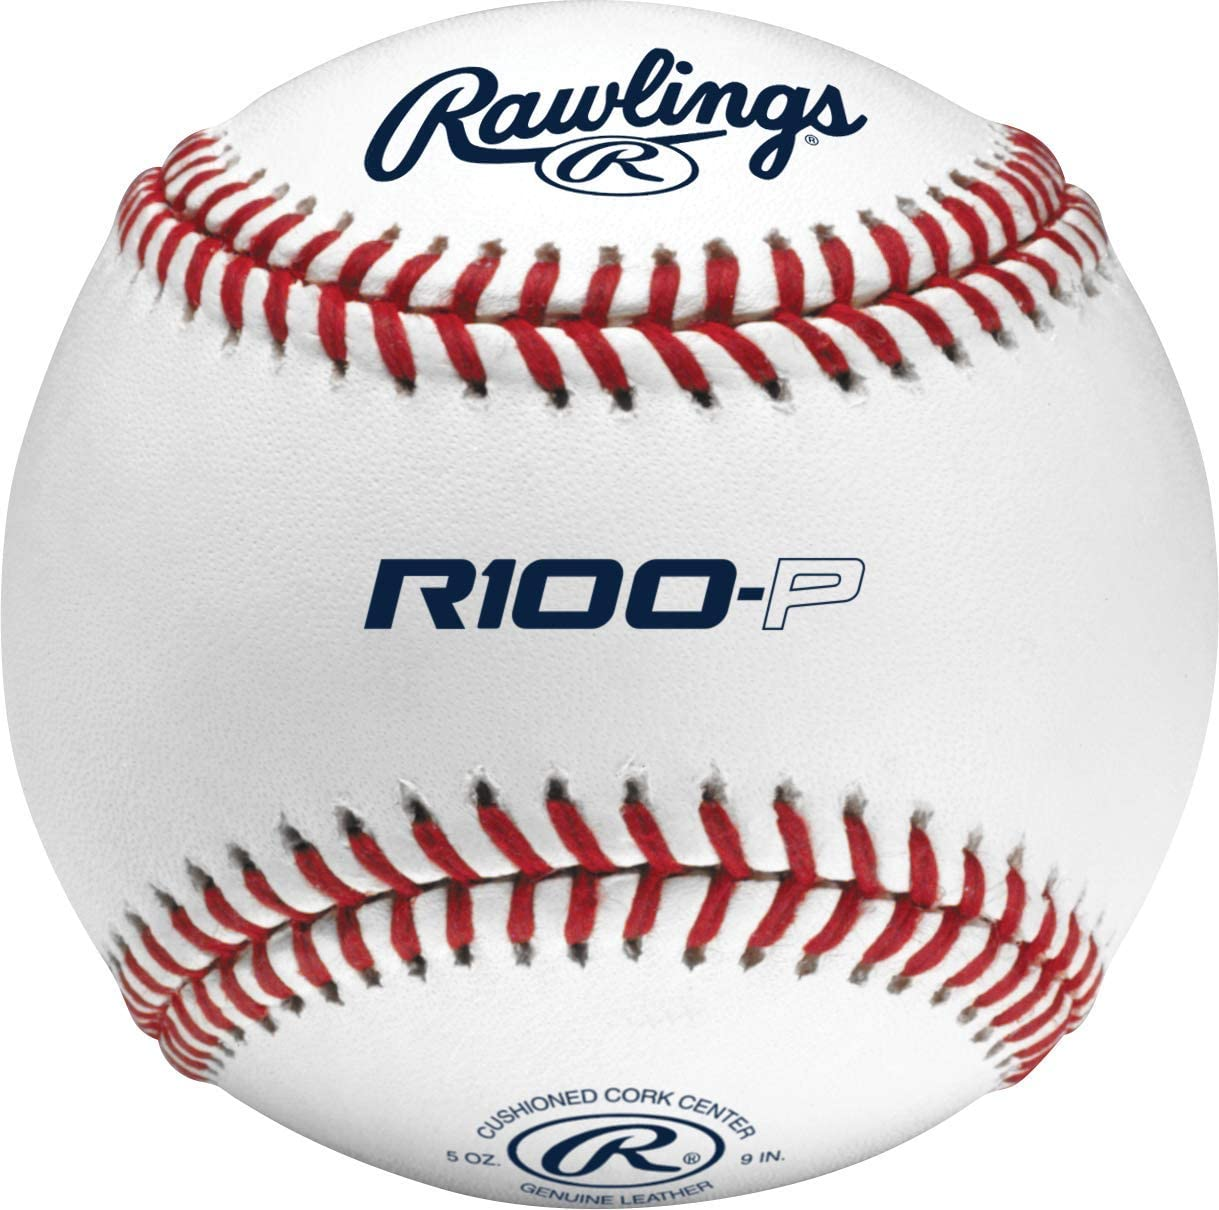 Rawlings R100-P High School Practice Baseball 12 Ball Pack